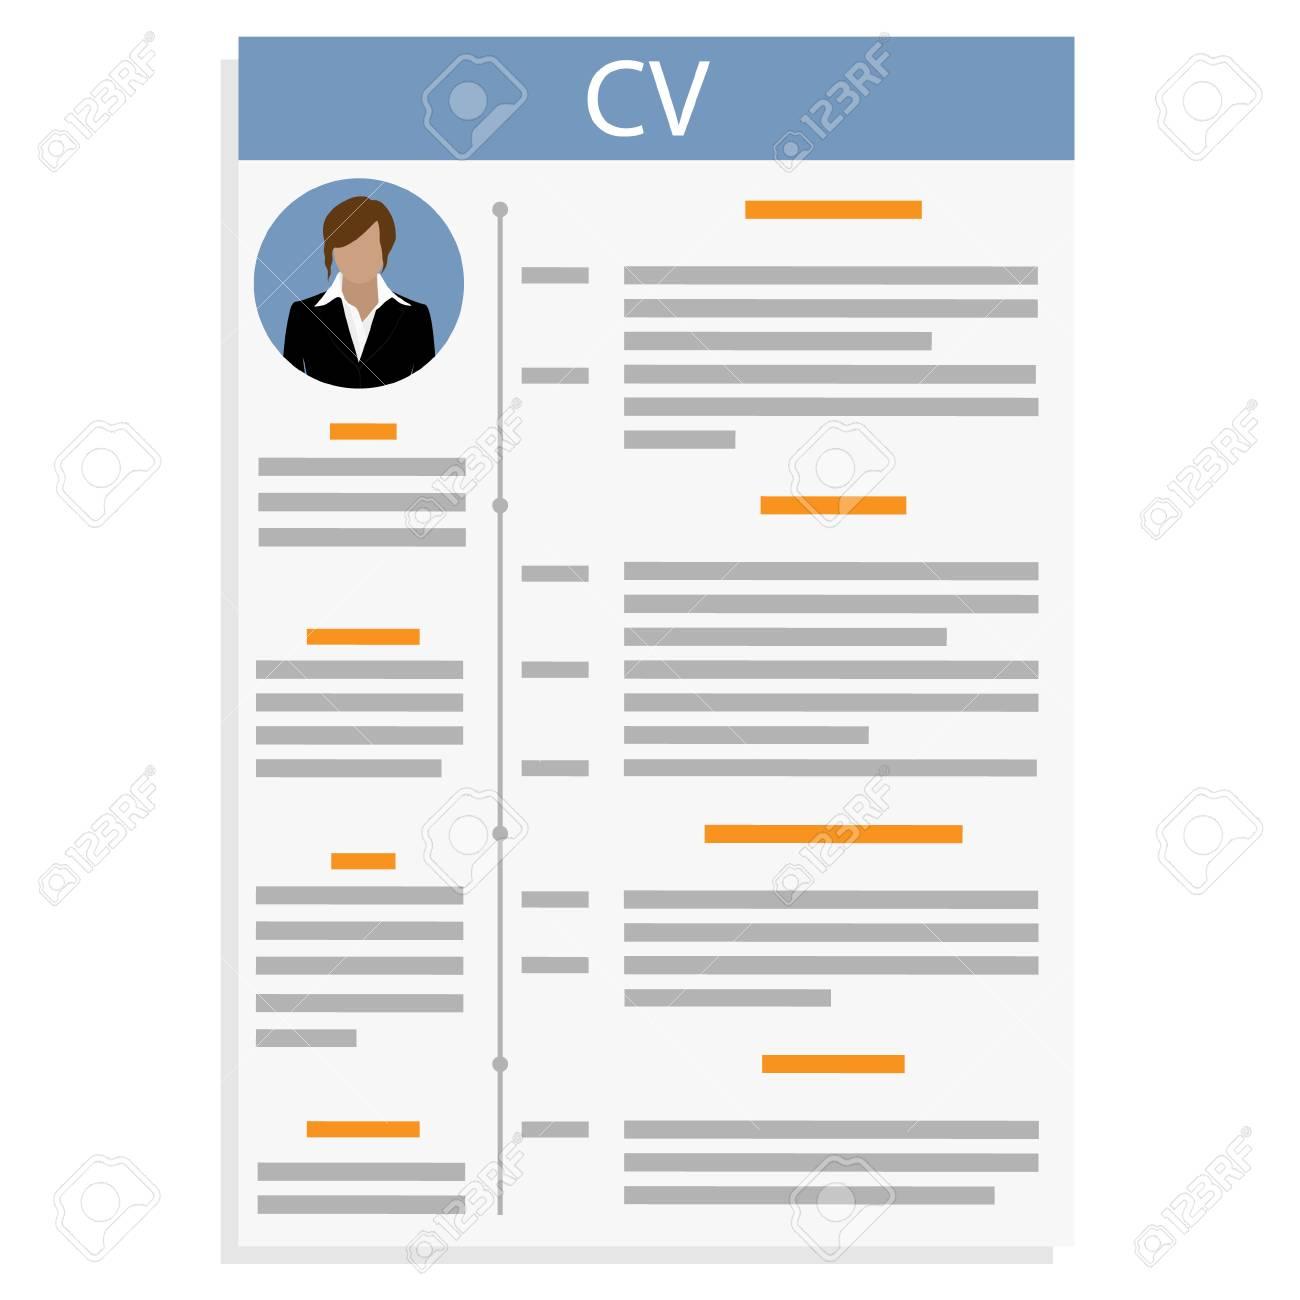 Ilustración De Trama CV O Curriculum Vitae Plantilla De Diseño Con ...